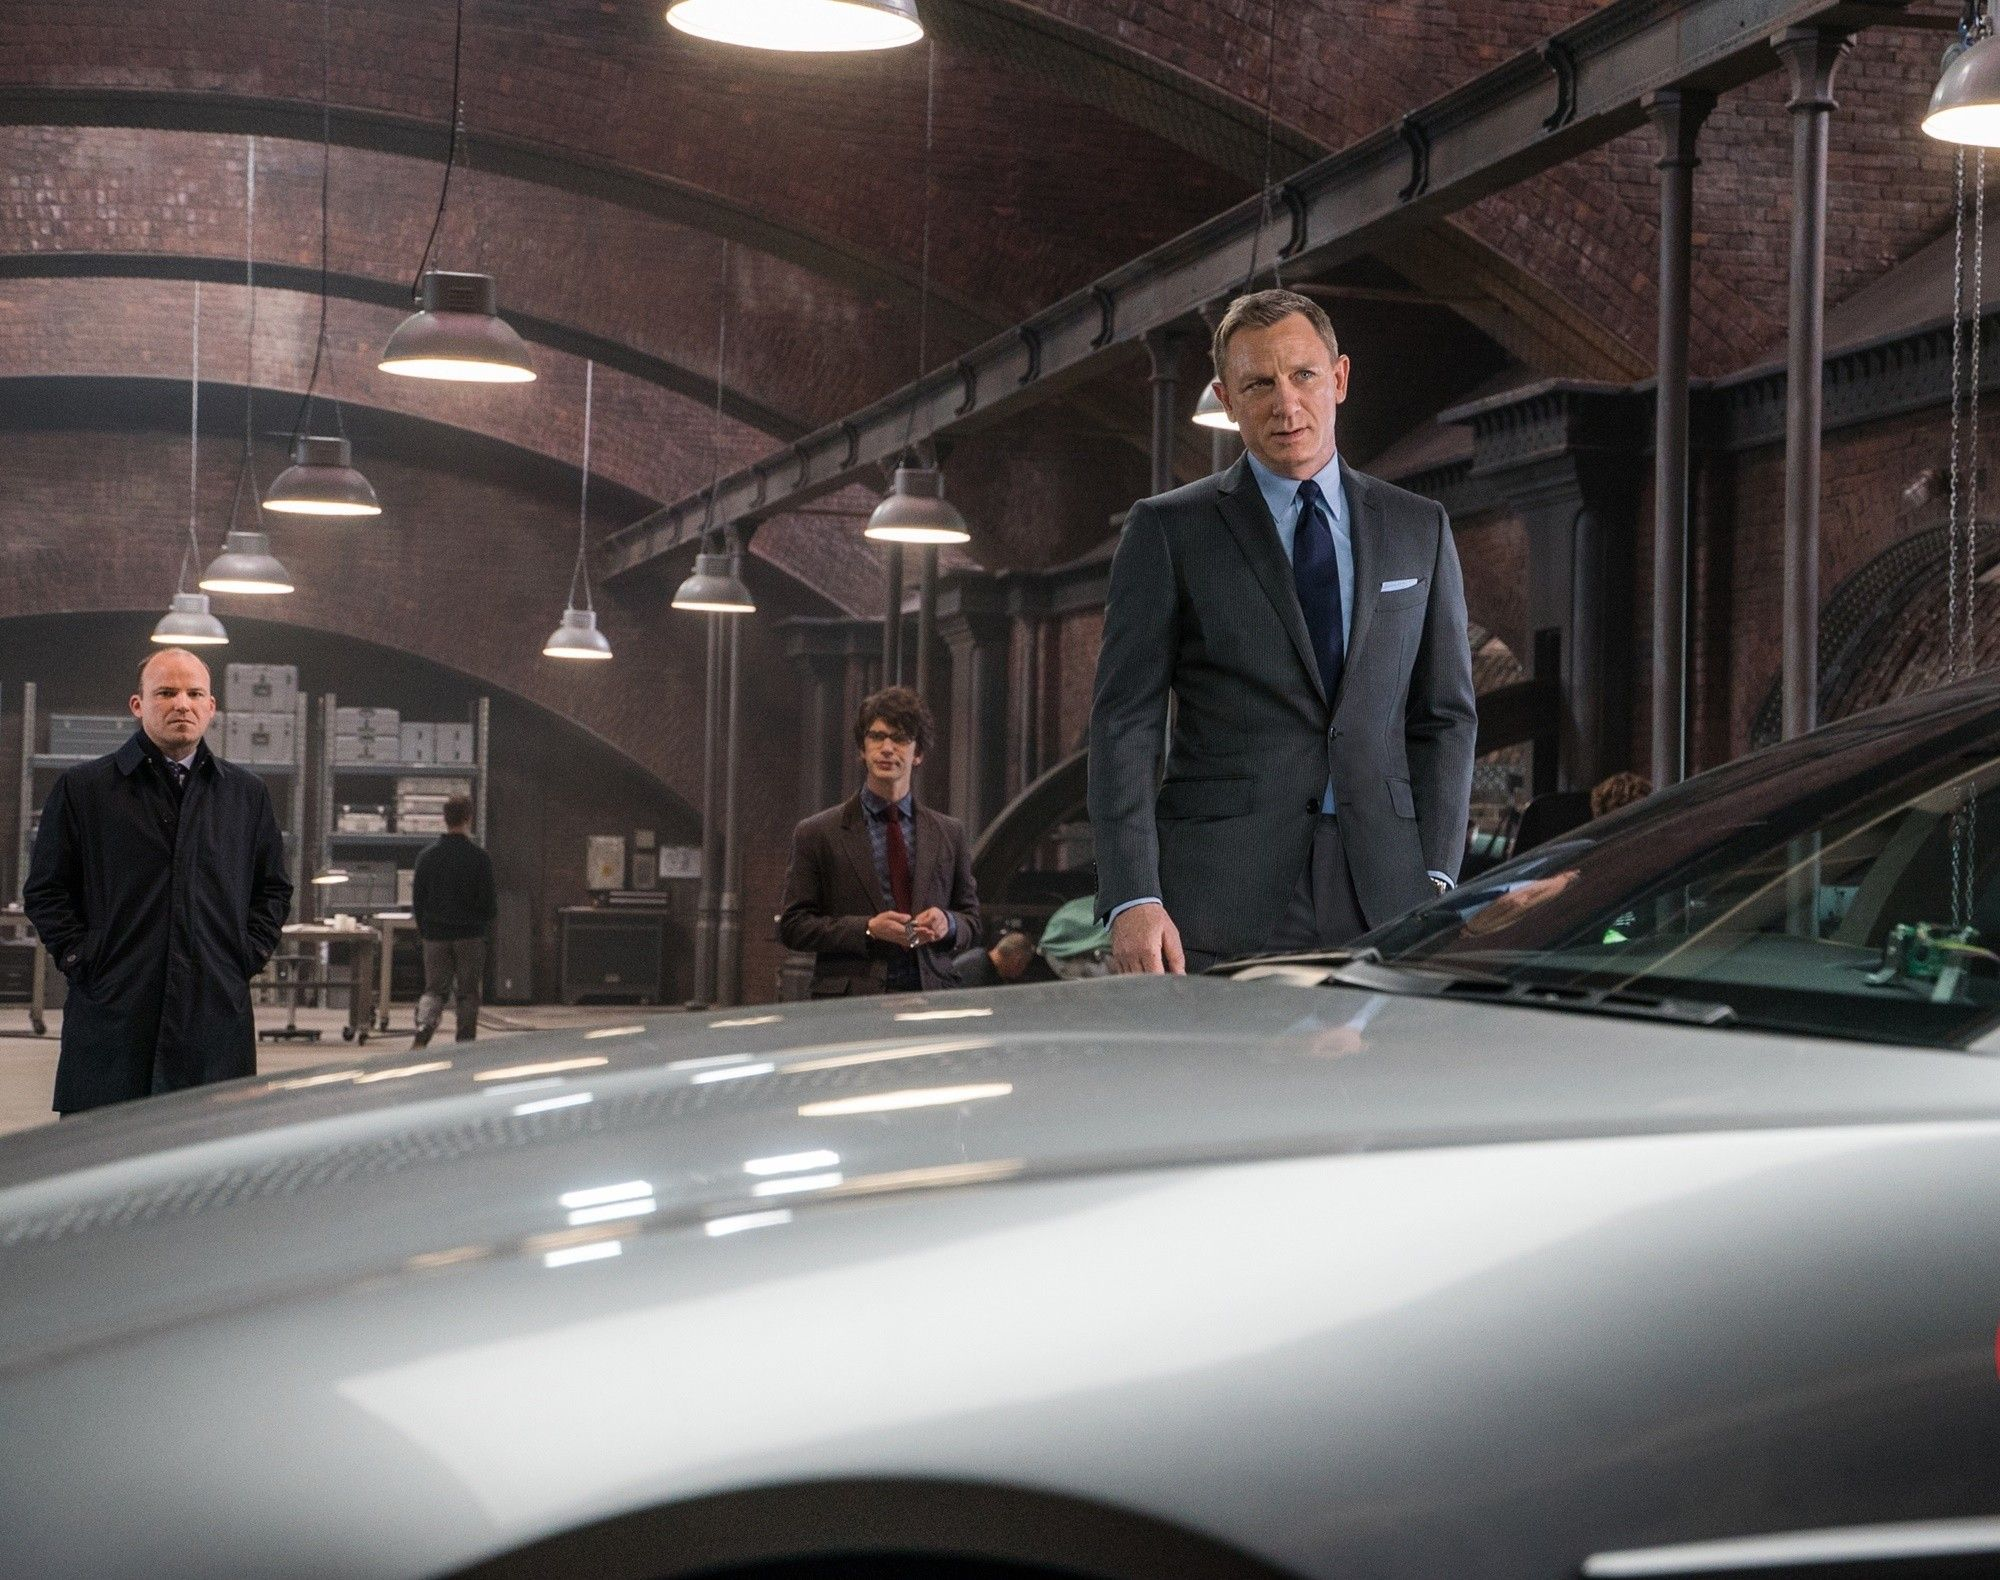 Daniel Craig, Ben Whishaw, and Rory Kinnear in Spectre (2015)